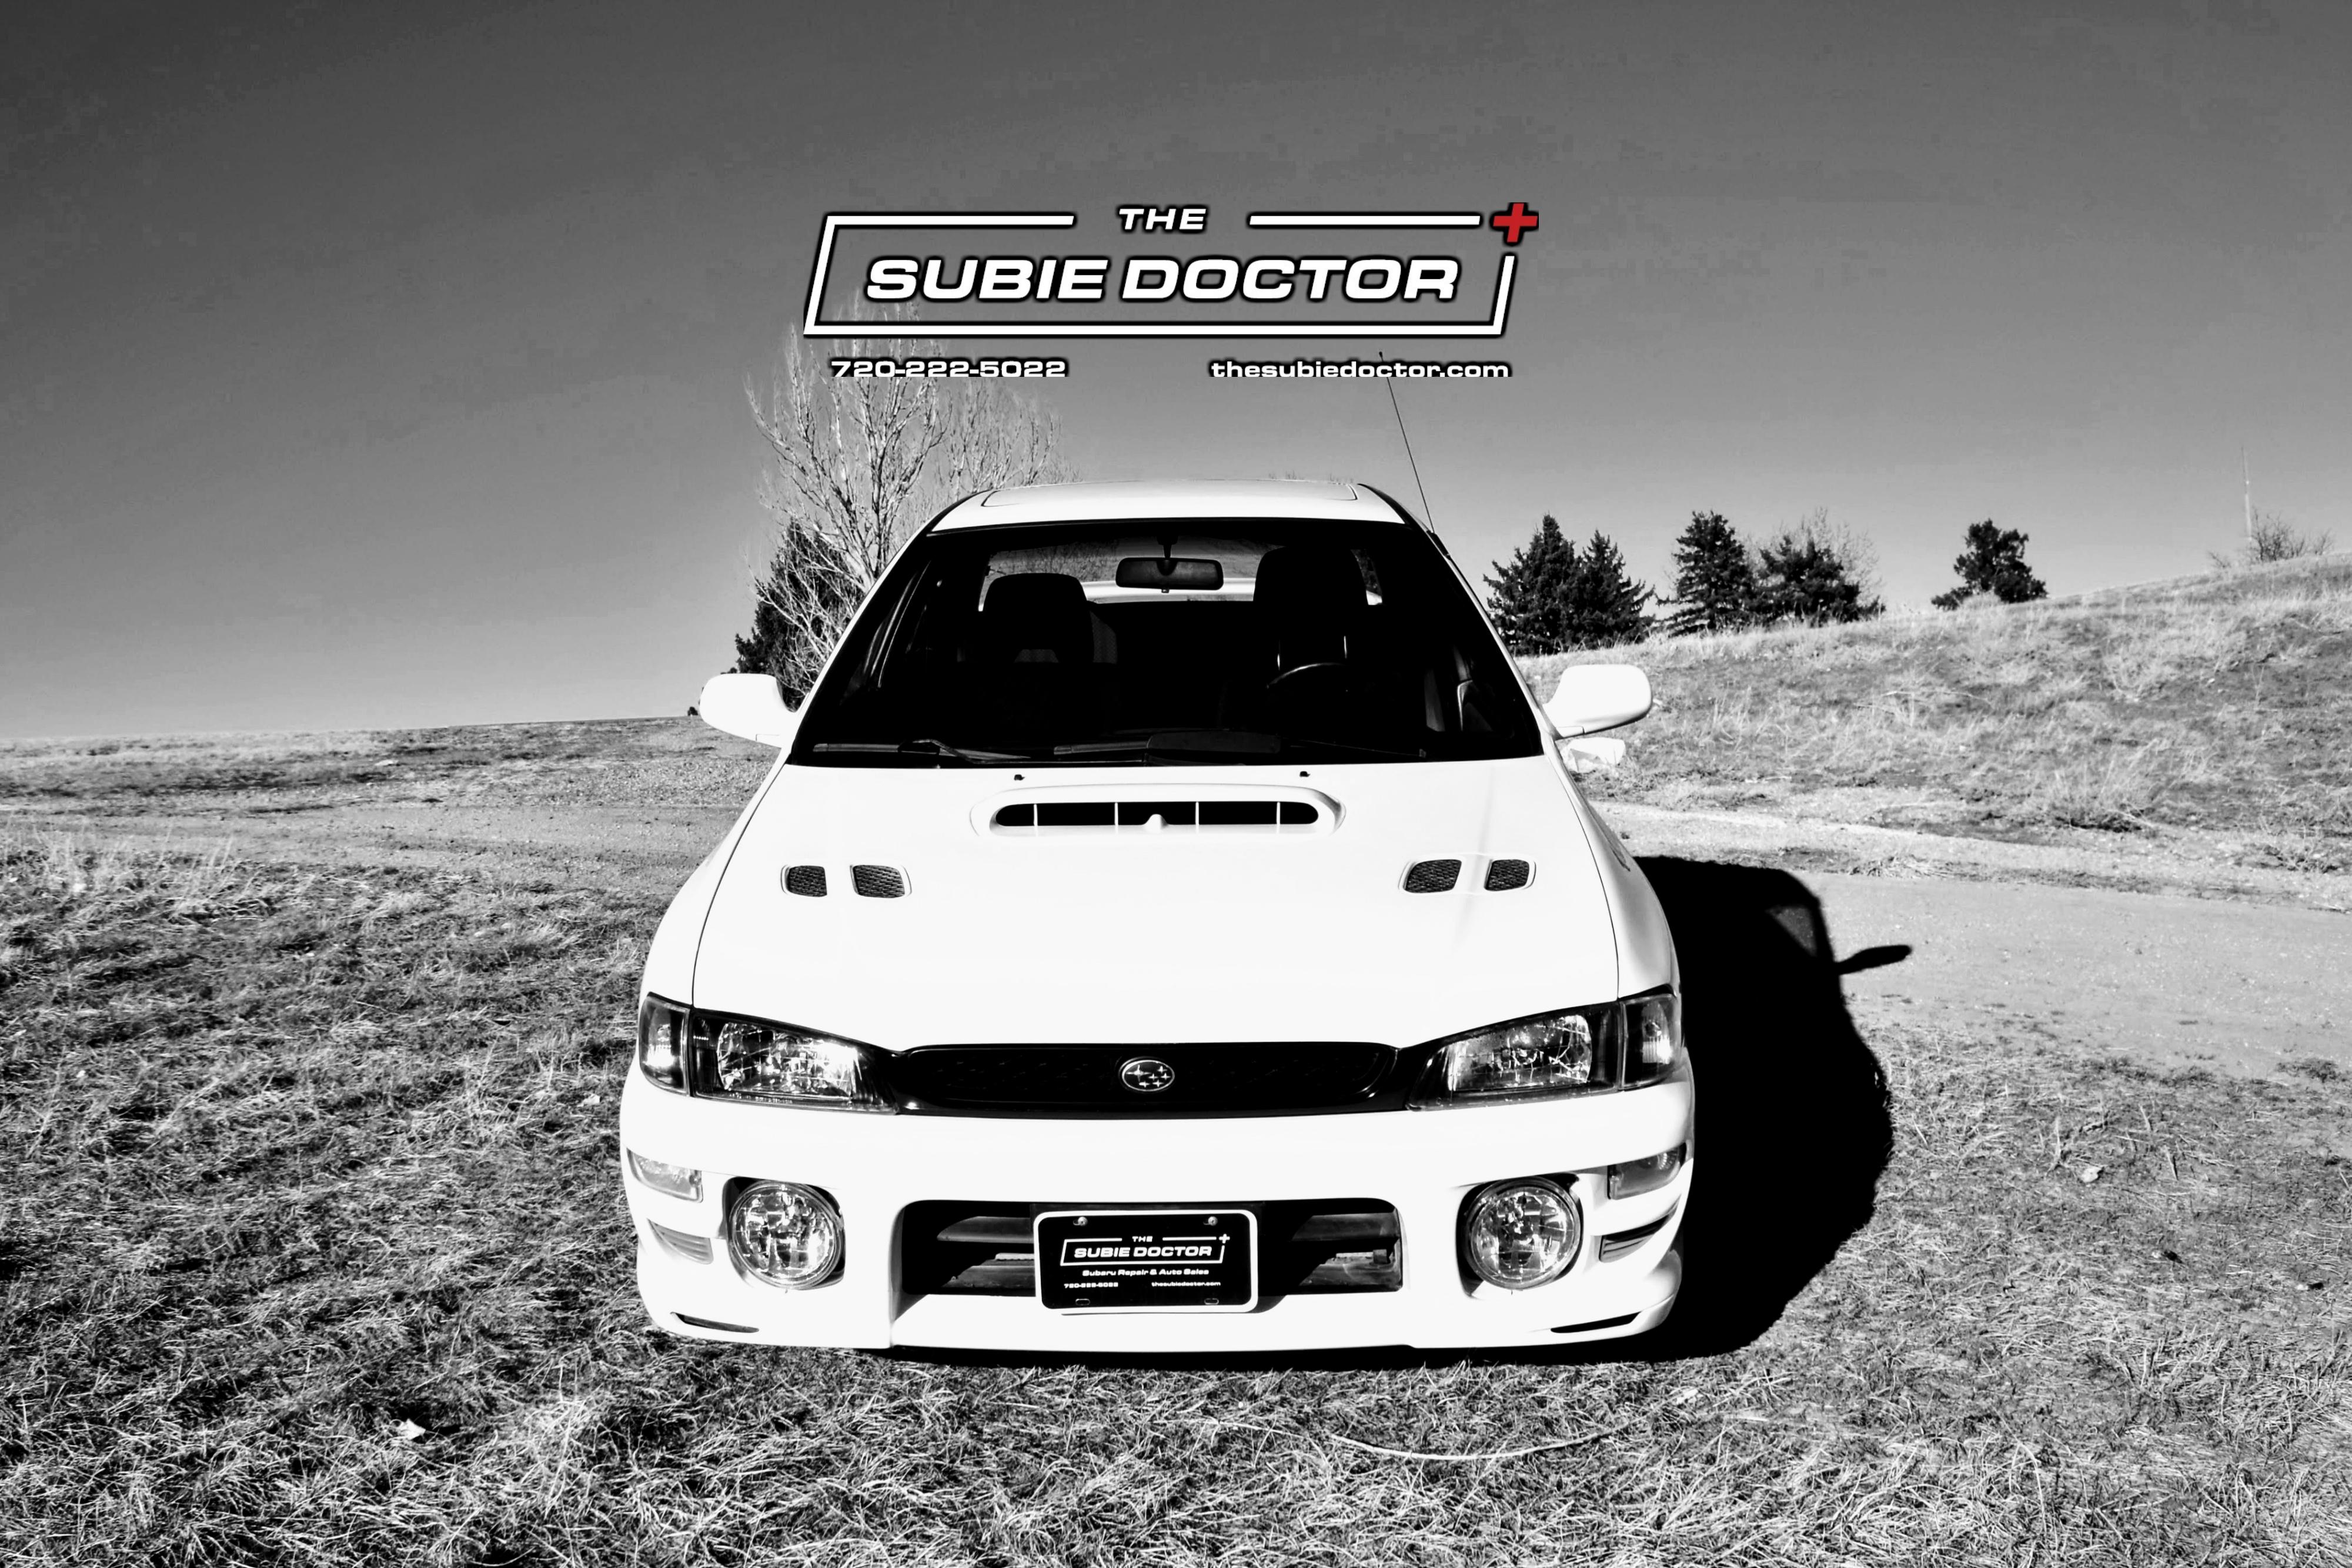 2000 Subaru Impreza 2.5 RS Sedan in Denver Colorado For Sale